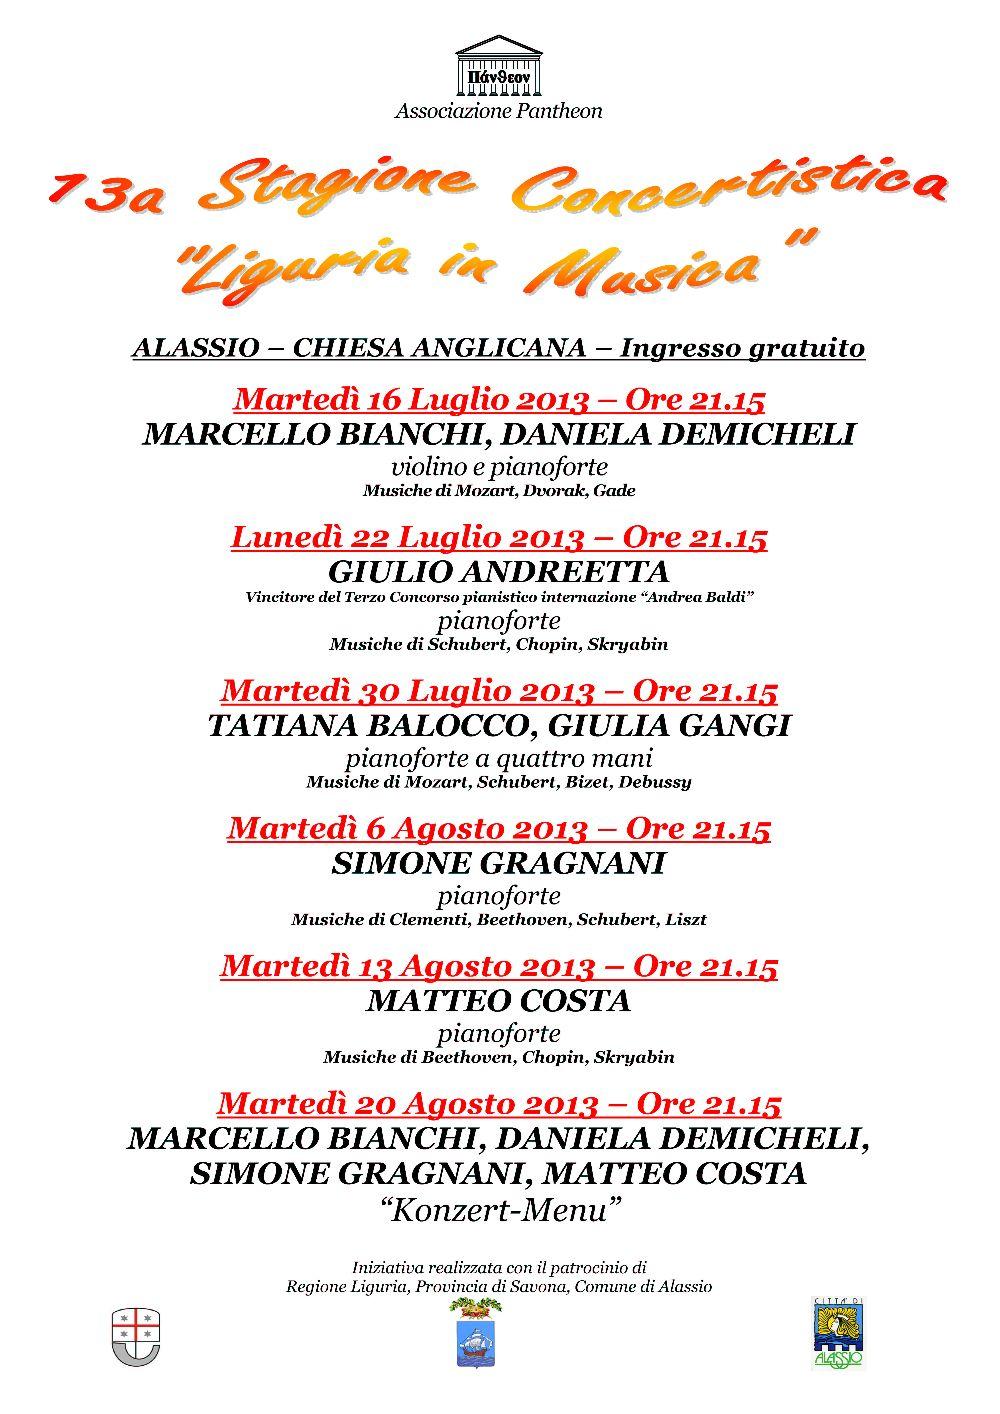 Locandina Liguria in Musica